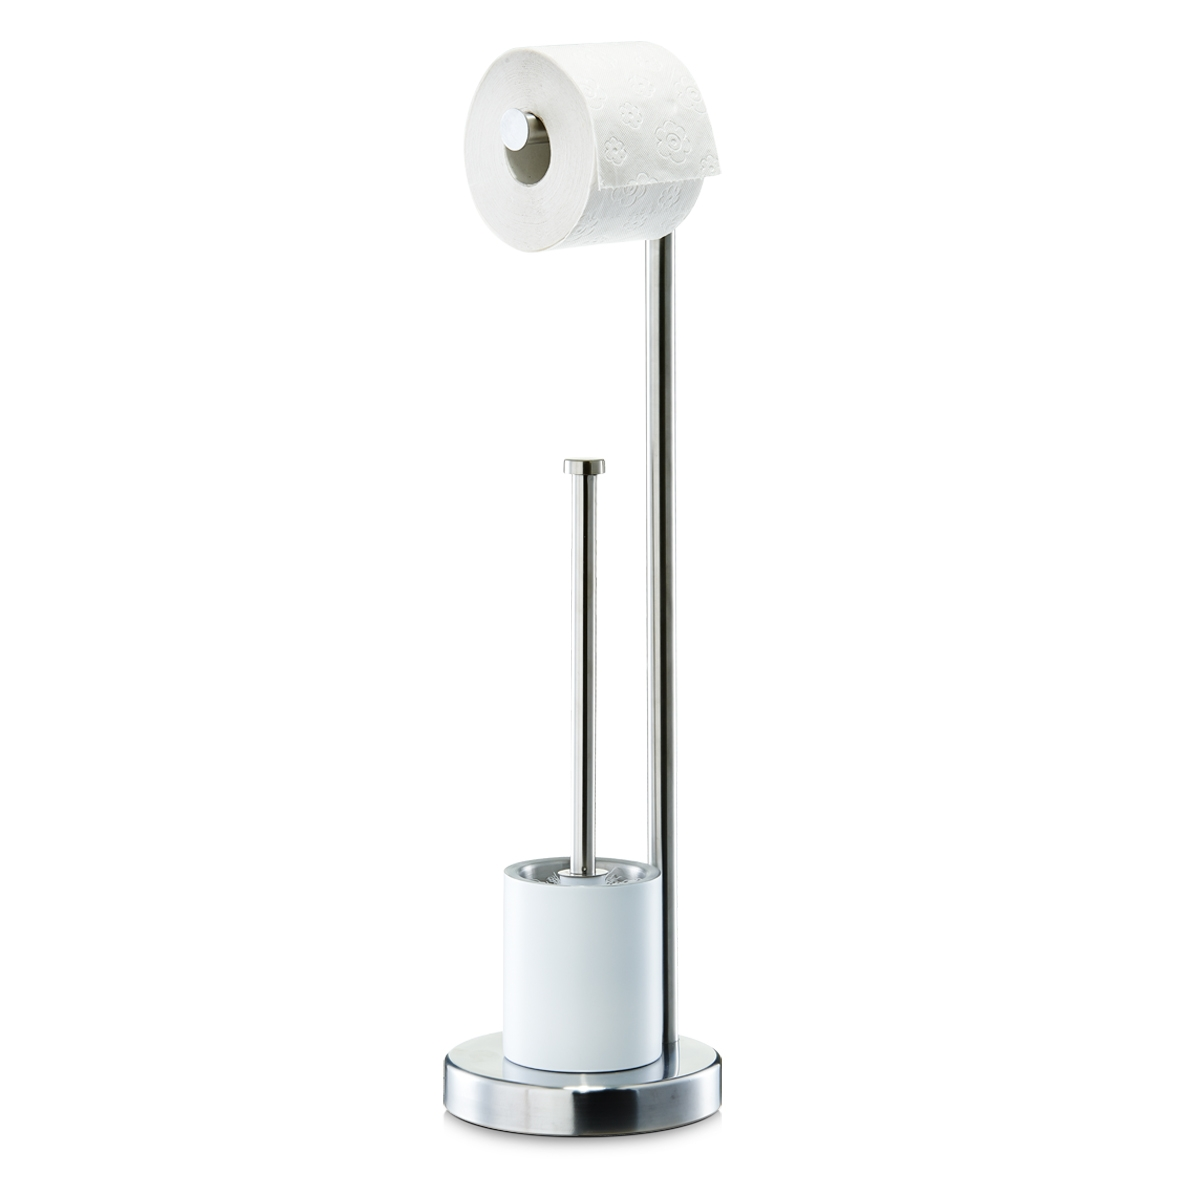 Suport pentru hartie igienica si perie de toaleta, Otel inoxidabil White, Ø 16,8xH60 cm